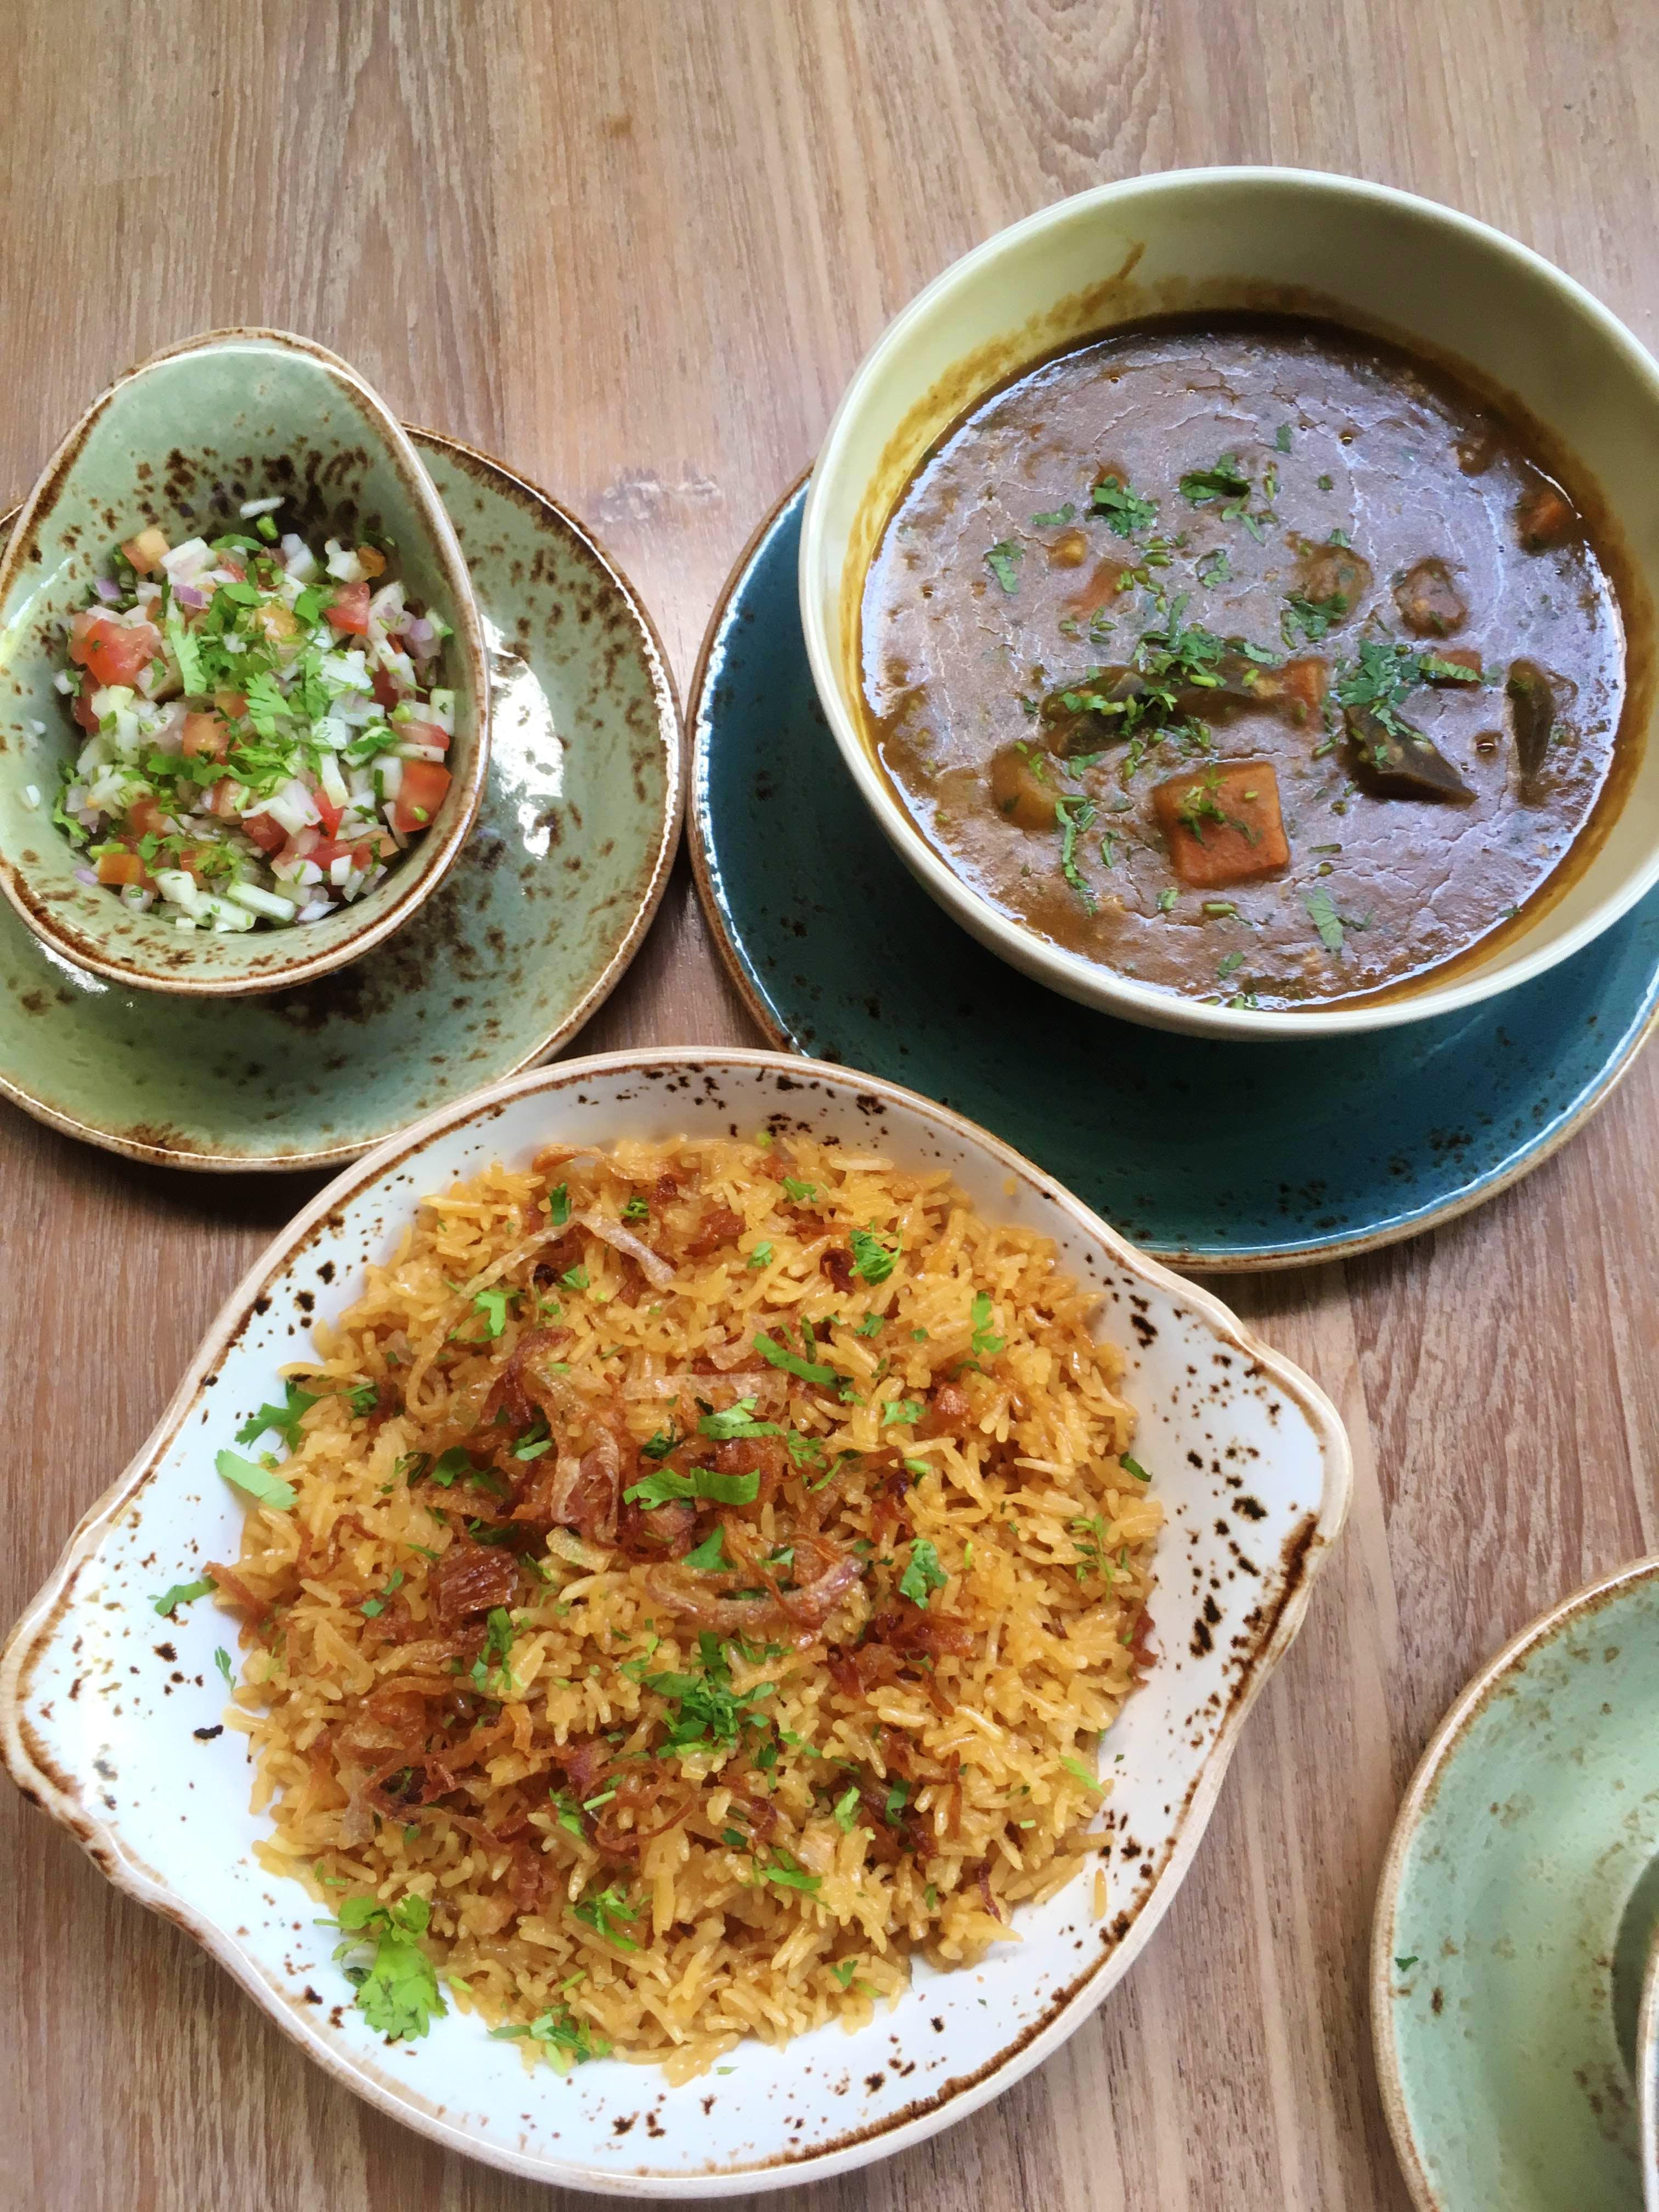 Dish,Food,Cuisine,Ingredient,Biryani,Produce,Indian cuisine,Recipe,Meal,Sevai